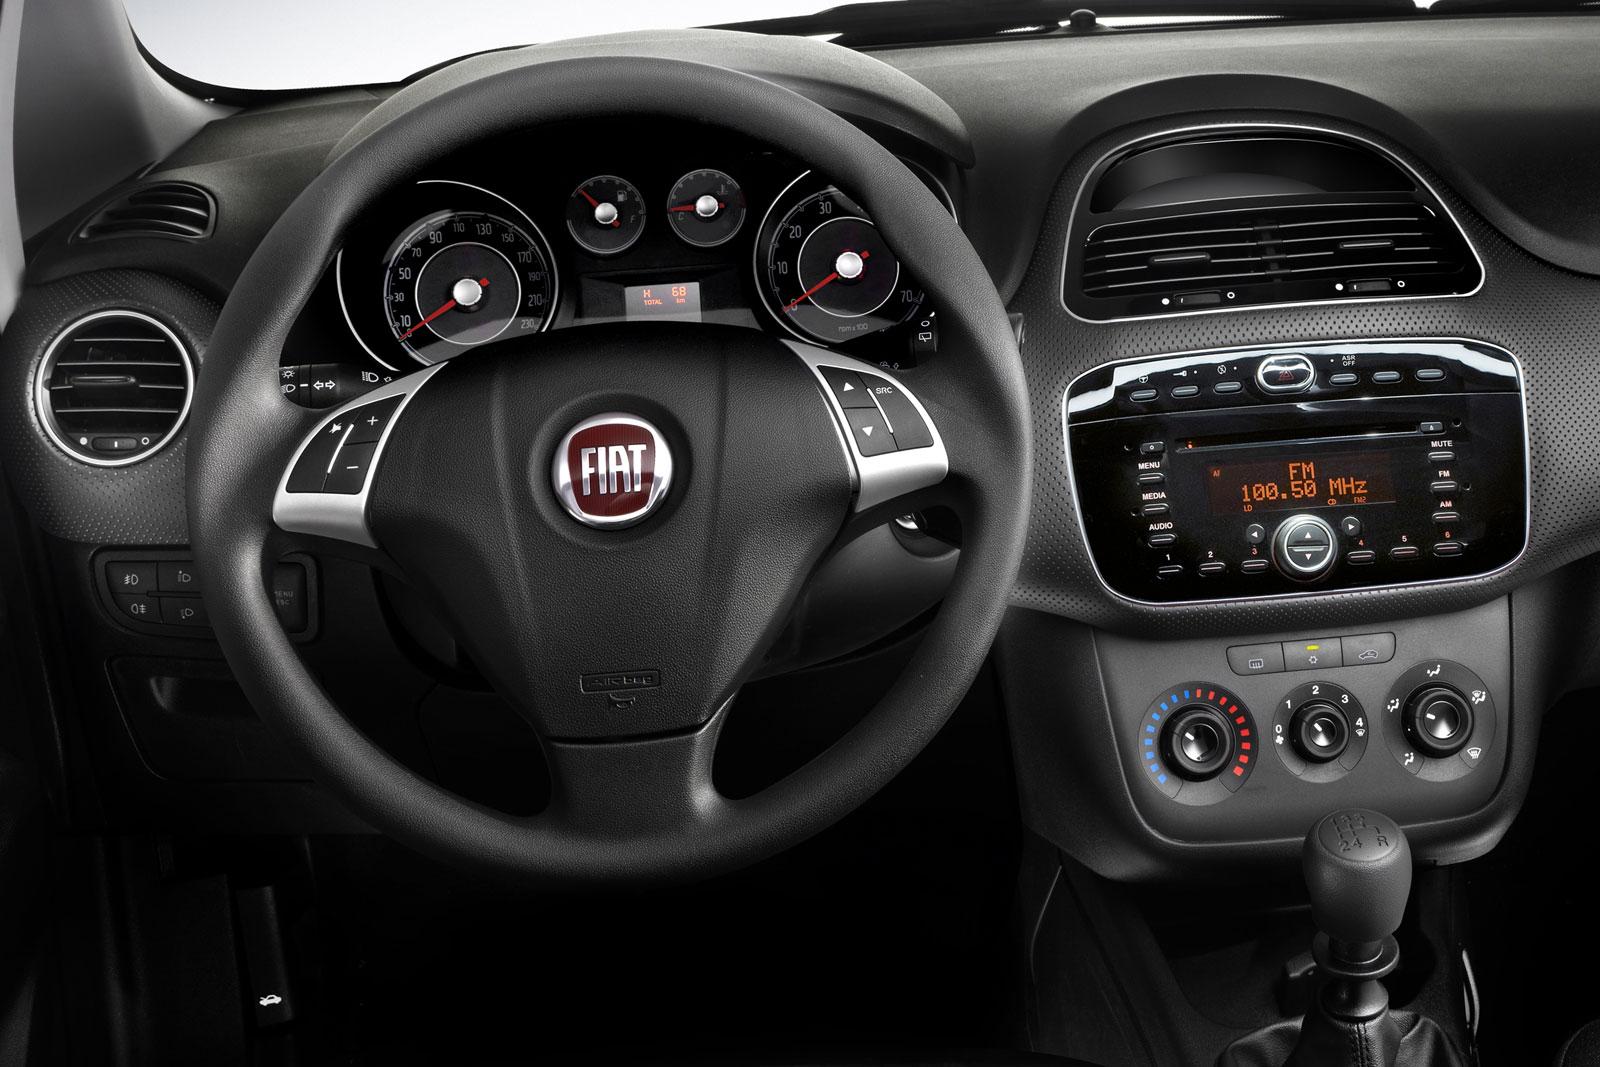 Fiat Punto Evo 2014 Interior Save Our Oceans